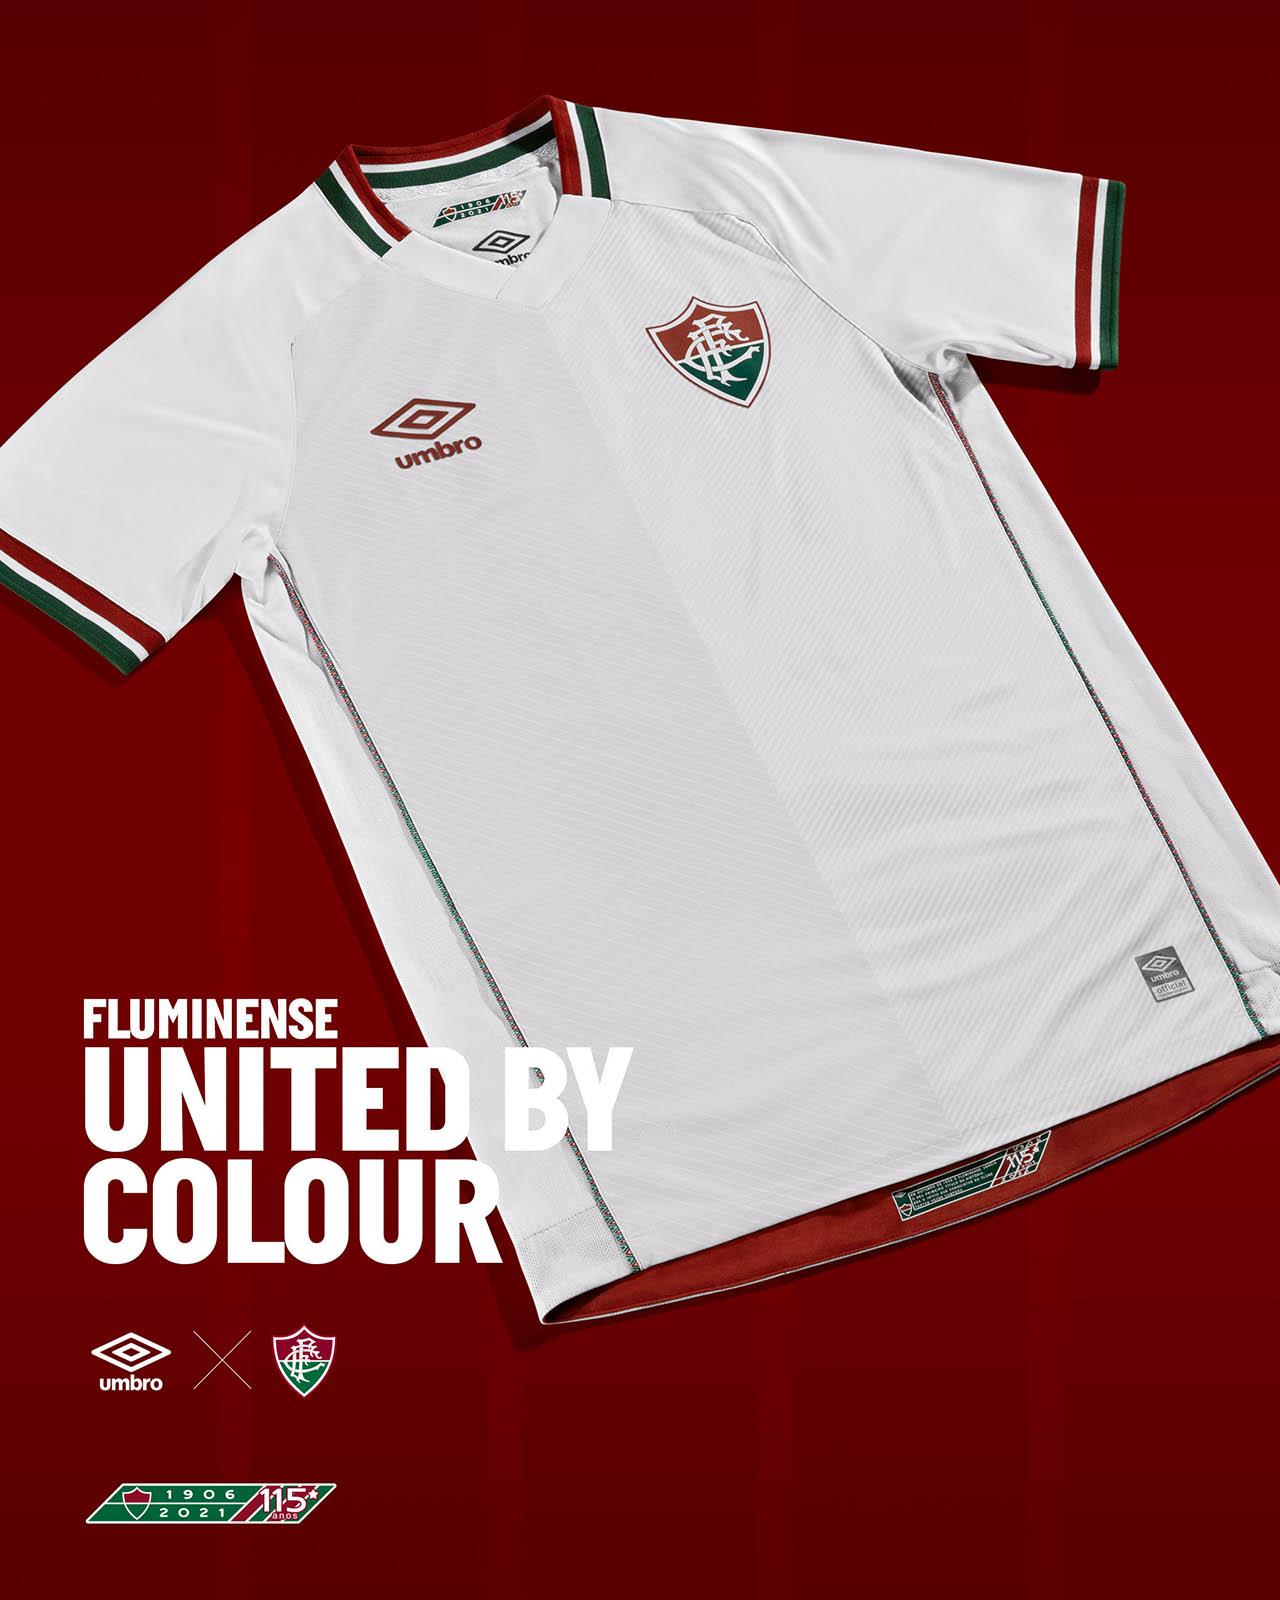 Camisa reserva do Fluminense 2021-2022 Umbro